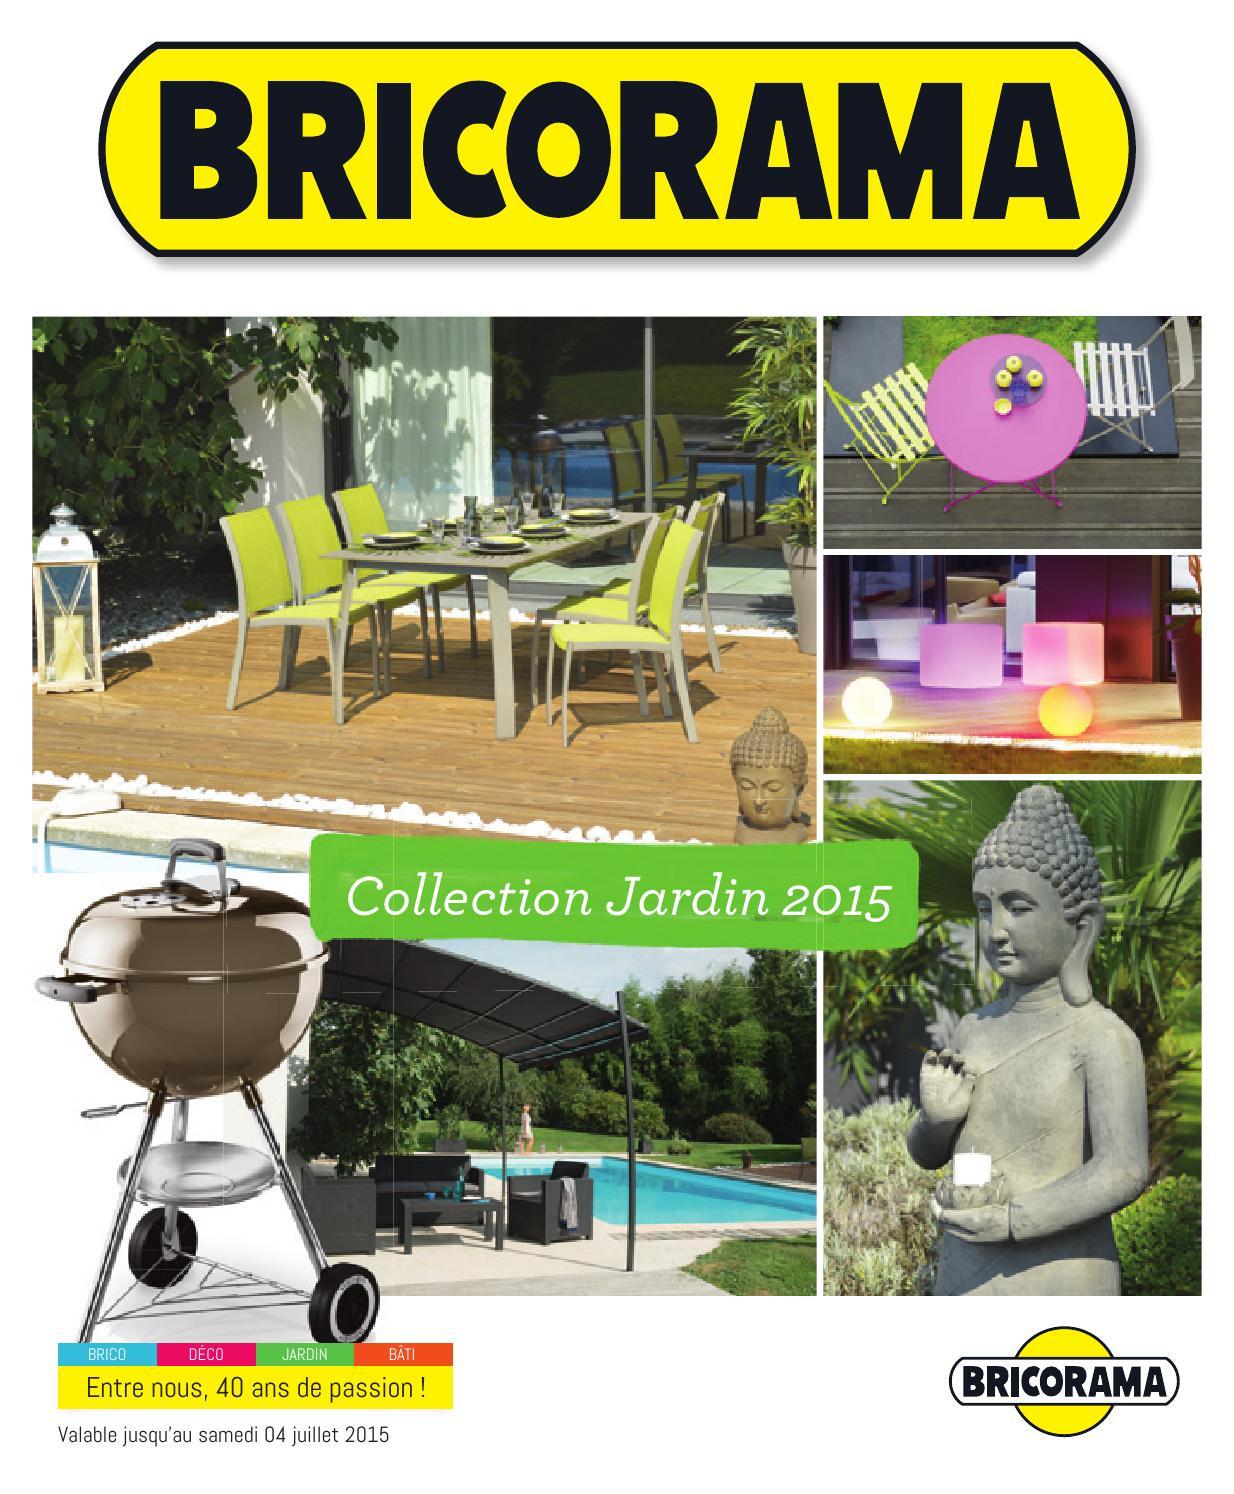 Bricorama Catalogue 23Mars 4Juillet2015 By Promocatalogues ... pour Abri De Jardin Bricorama